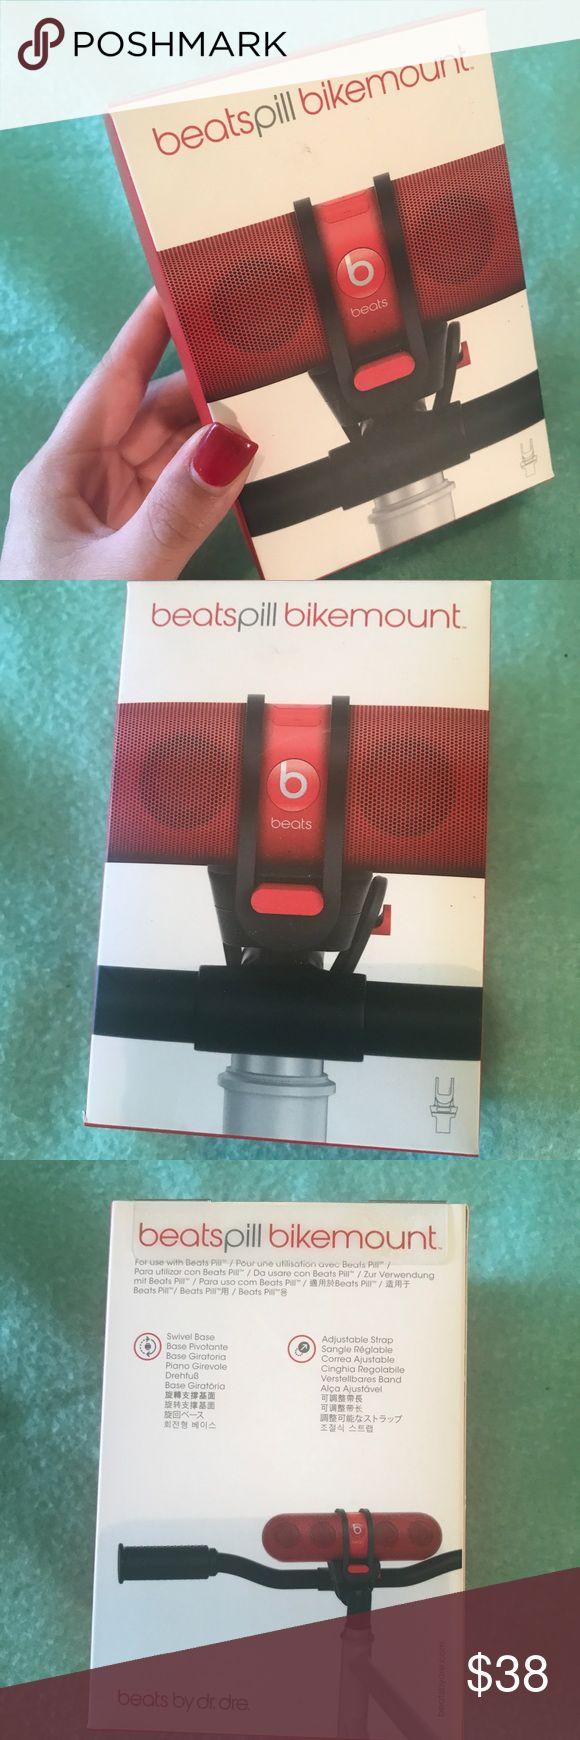 🆕 NEW BEATS PILL BIKE MOUNT NEW STILL IN BOX NEVER OPENED Beats Pill Bike Mount Amazing Quality and really unique! #beatspill #beats #beatsbydre Beats By Dre Accessories